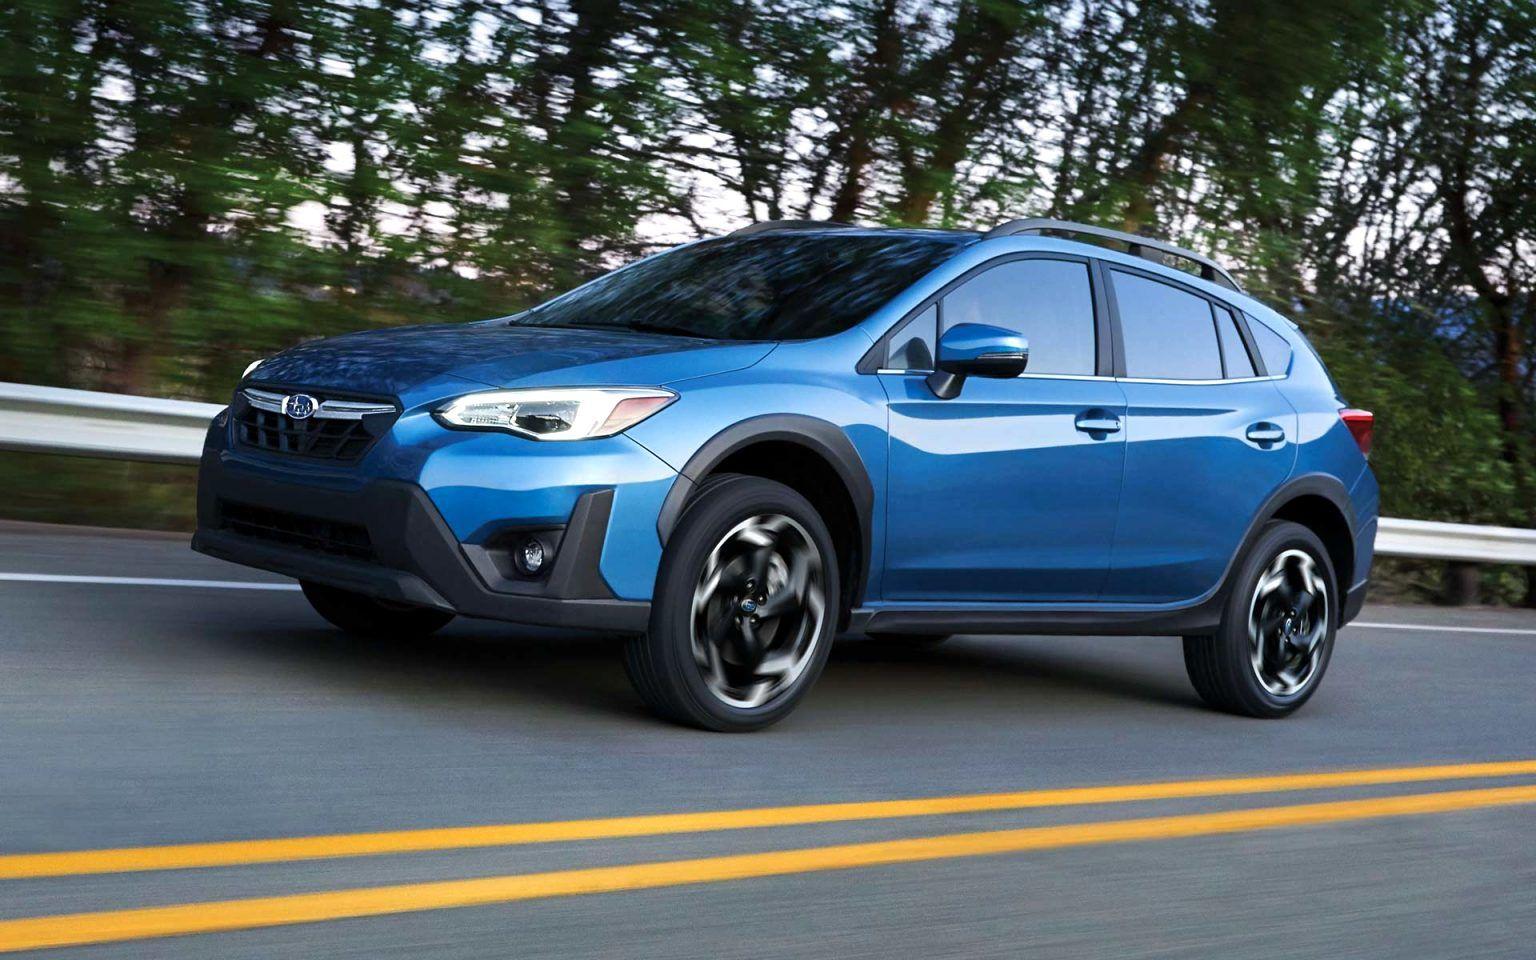 2021 Subaru Usa Release Date And Concept In 2021 Subaru Crosstrek Subaru Subaru Suv